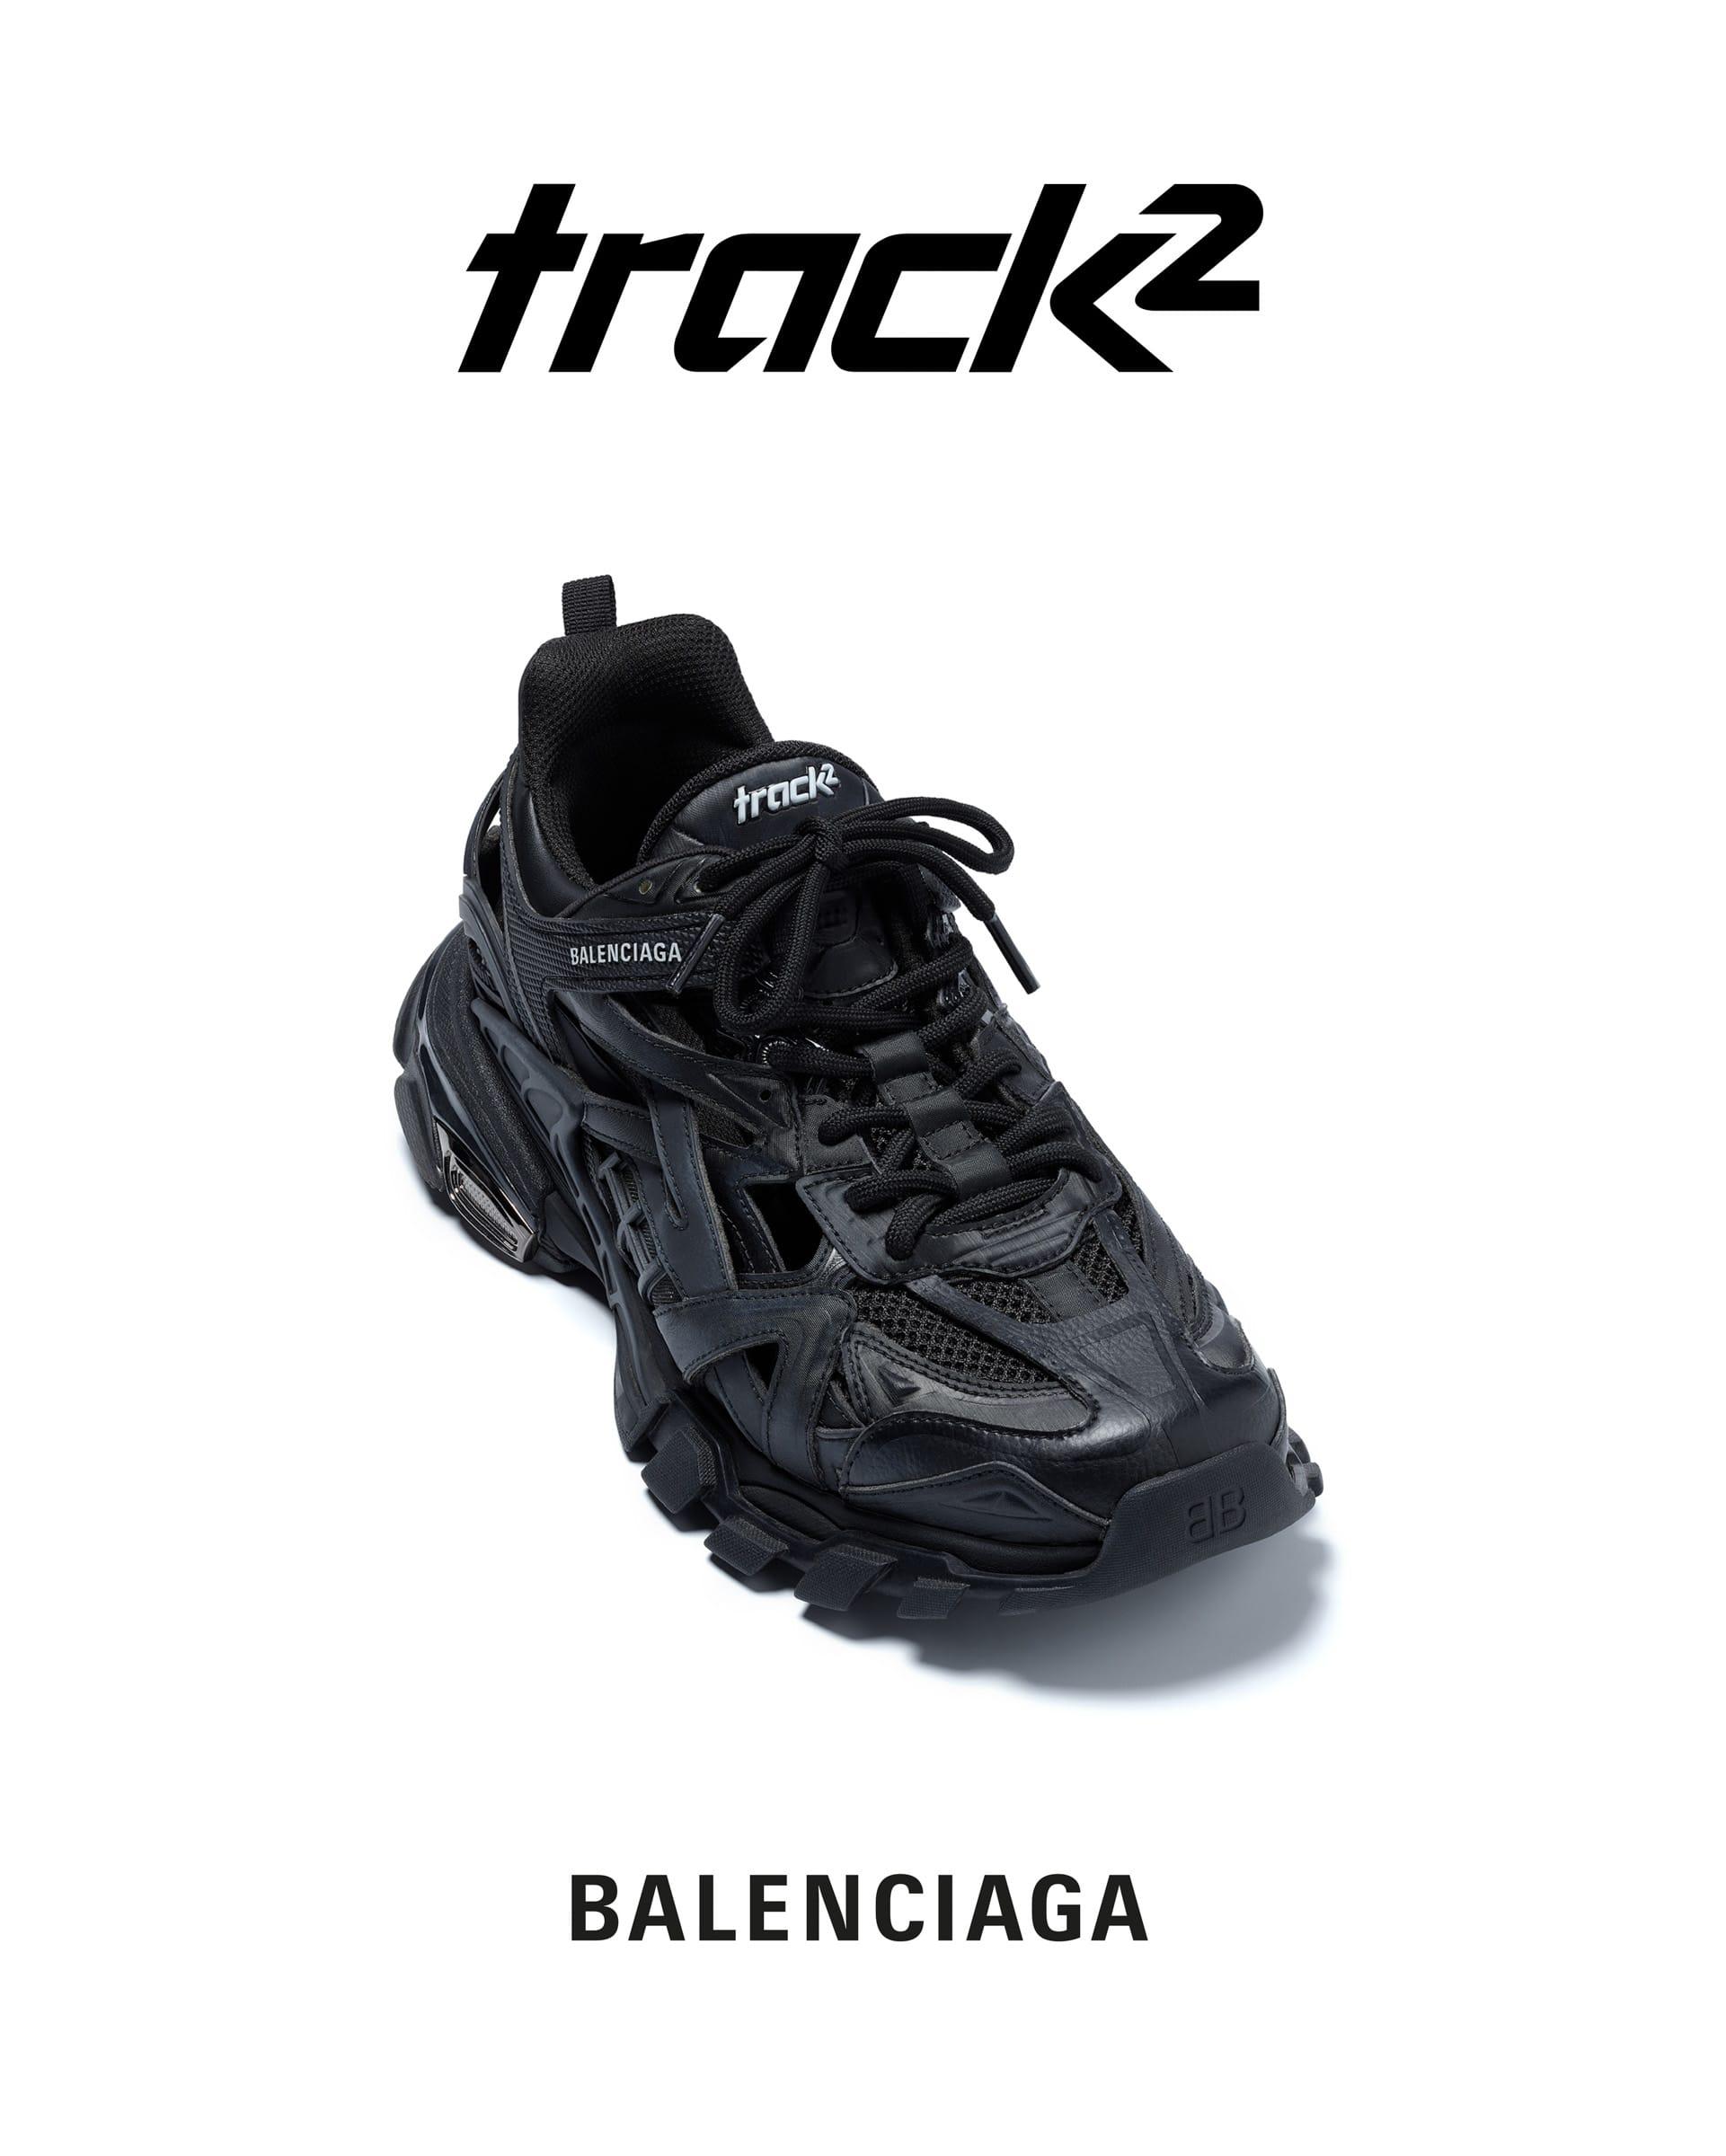 BALENCIAGA (バレンシアガ)TRACK.2